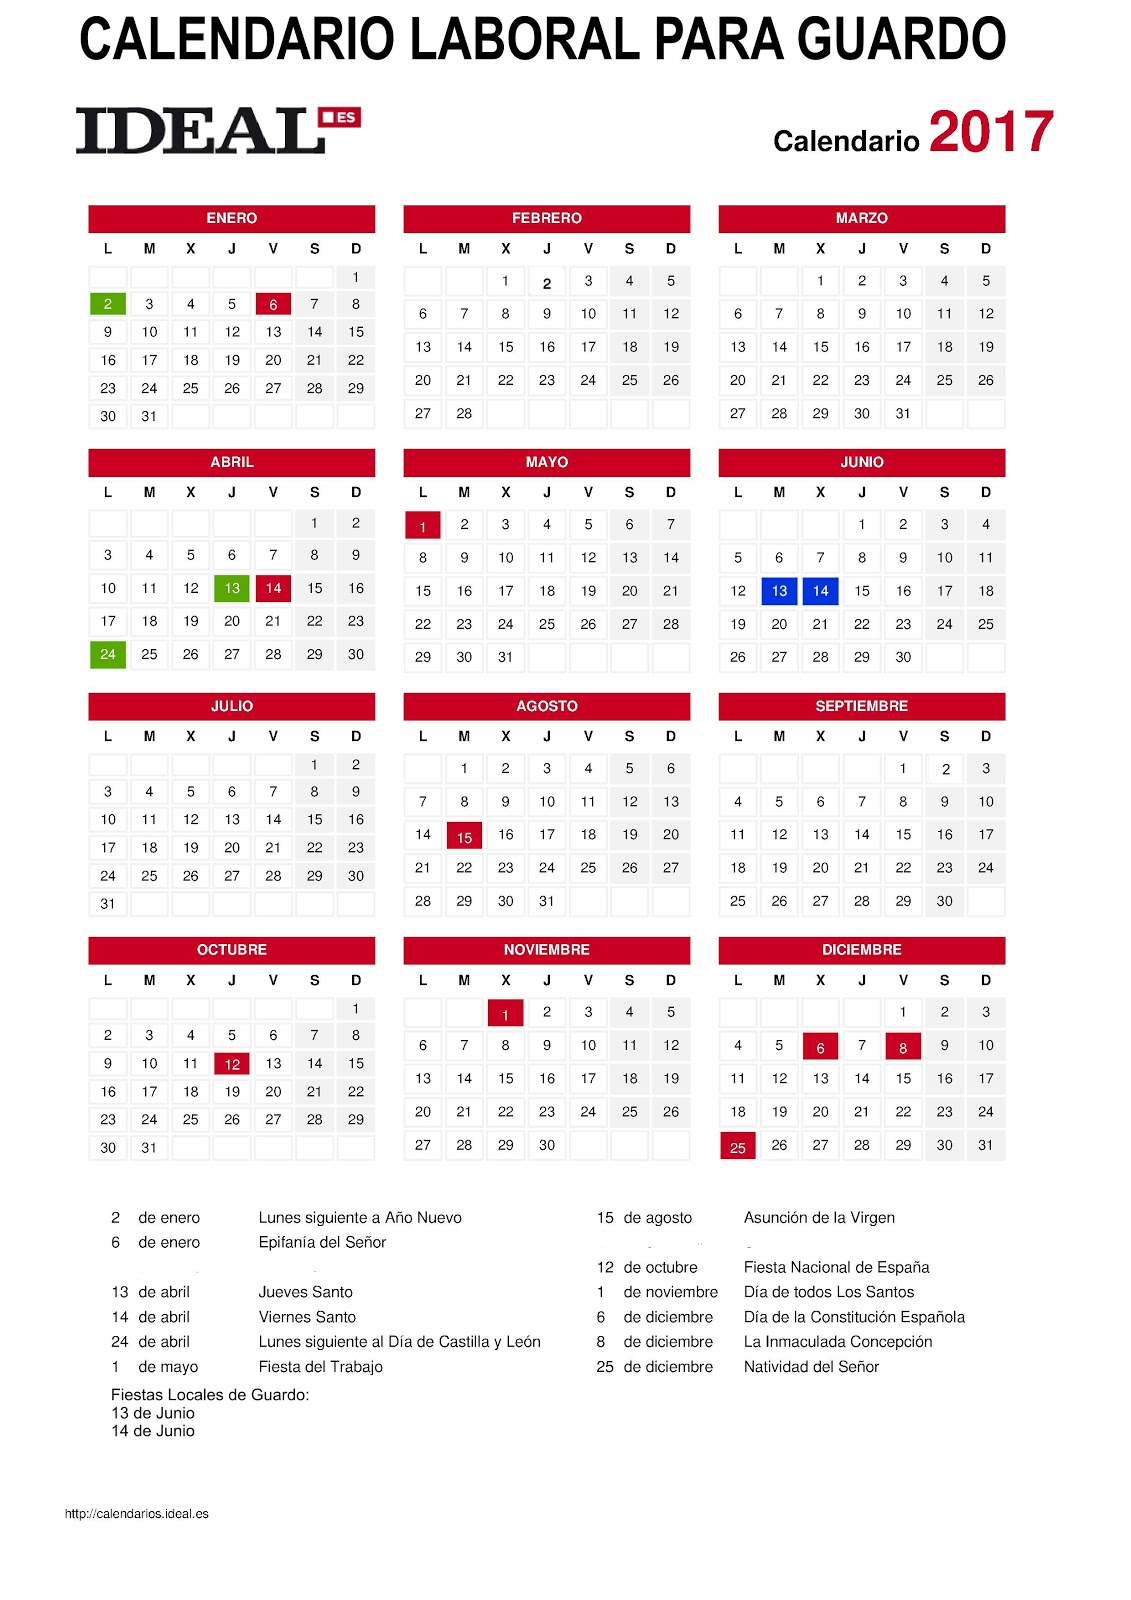 Calendario laboral 2017 para guardo for Calendario laboral leganes 2017